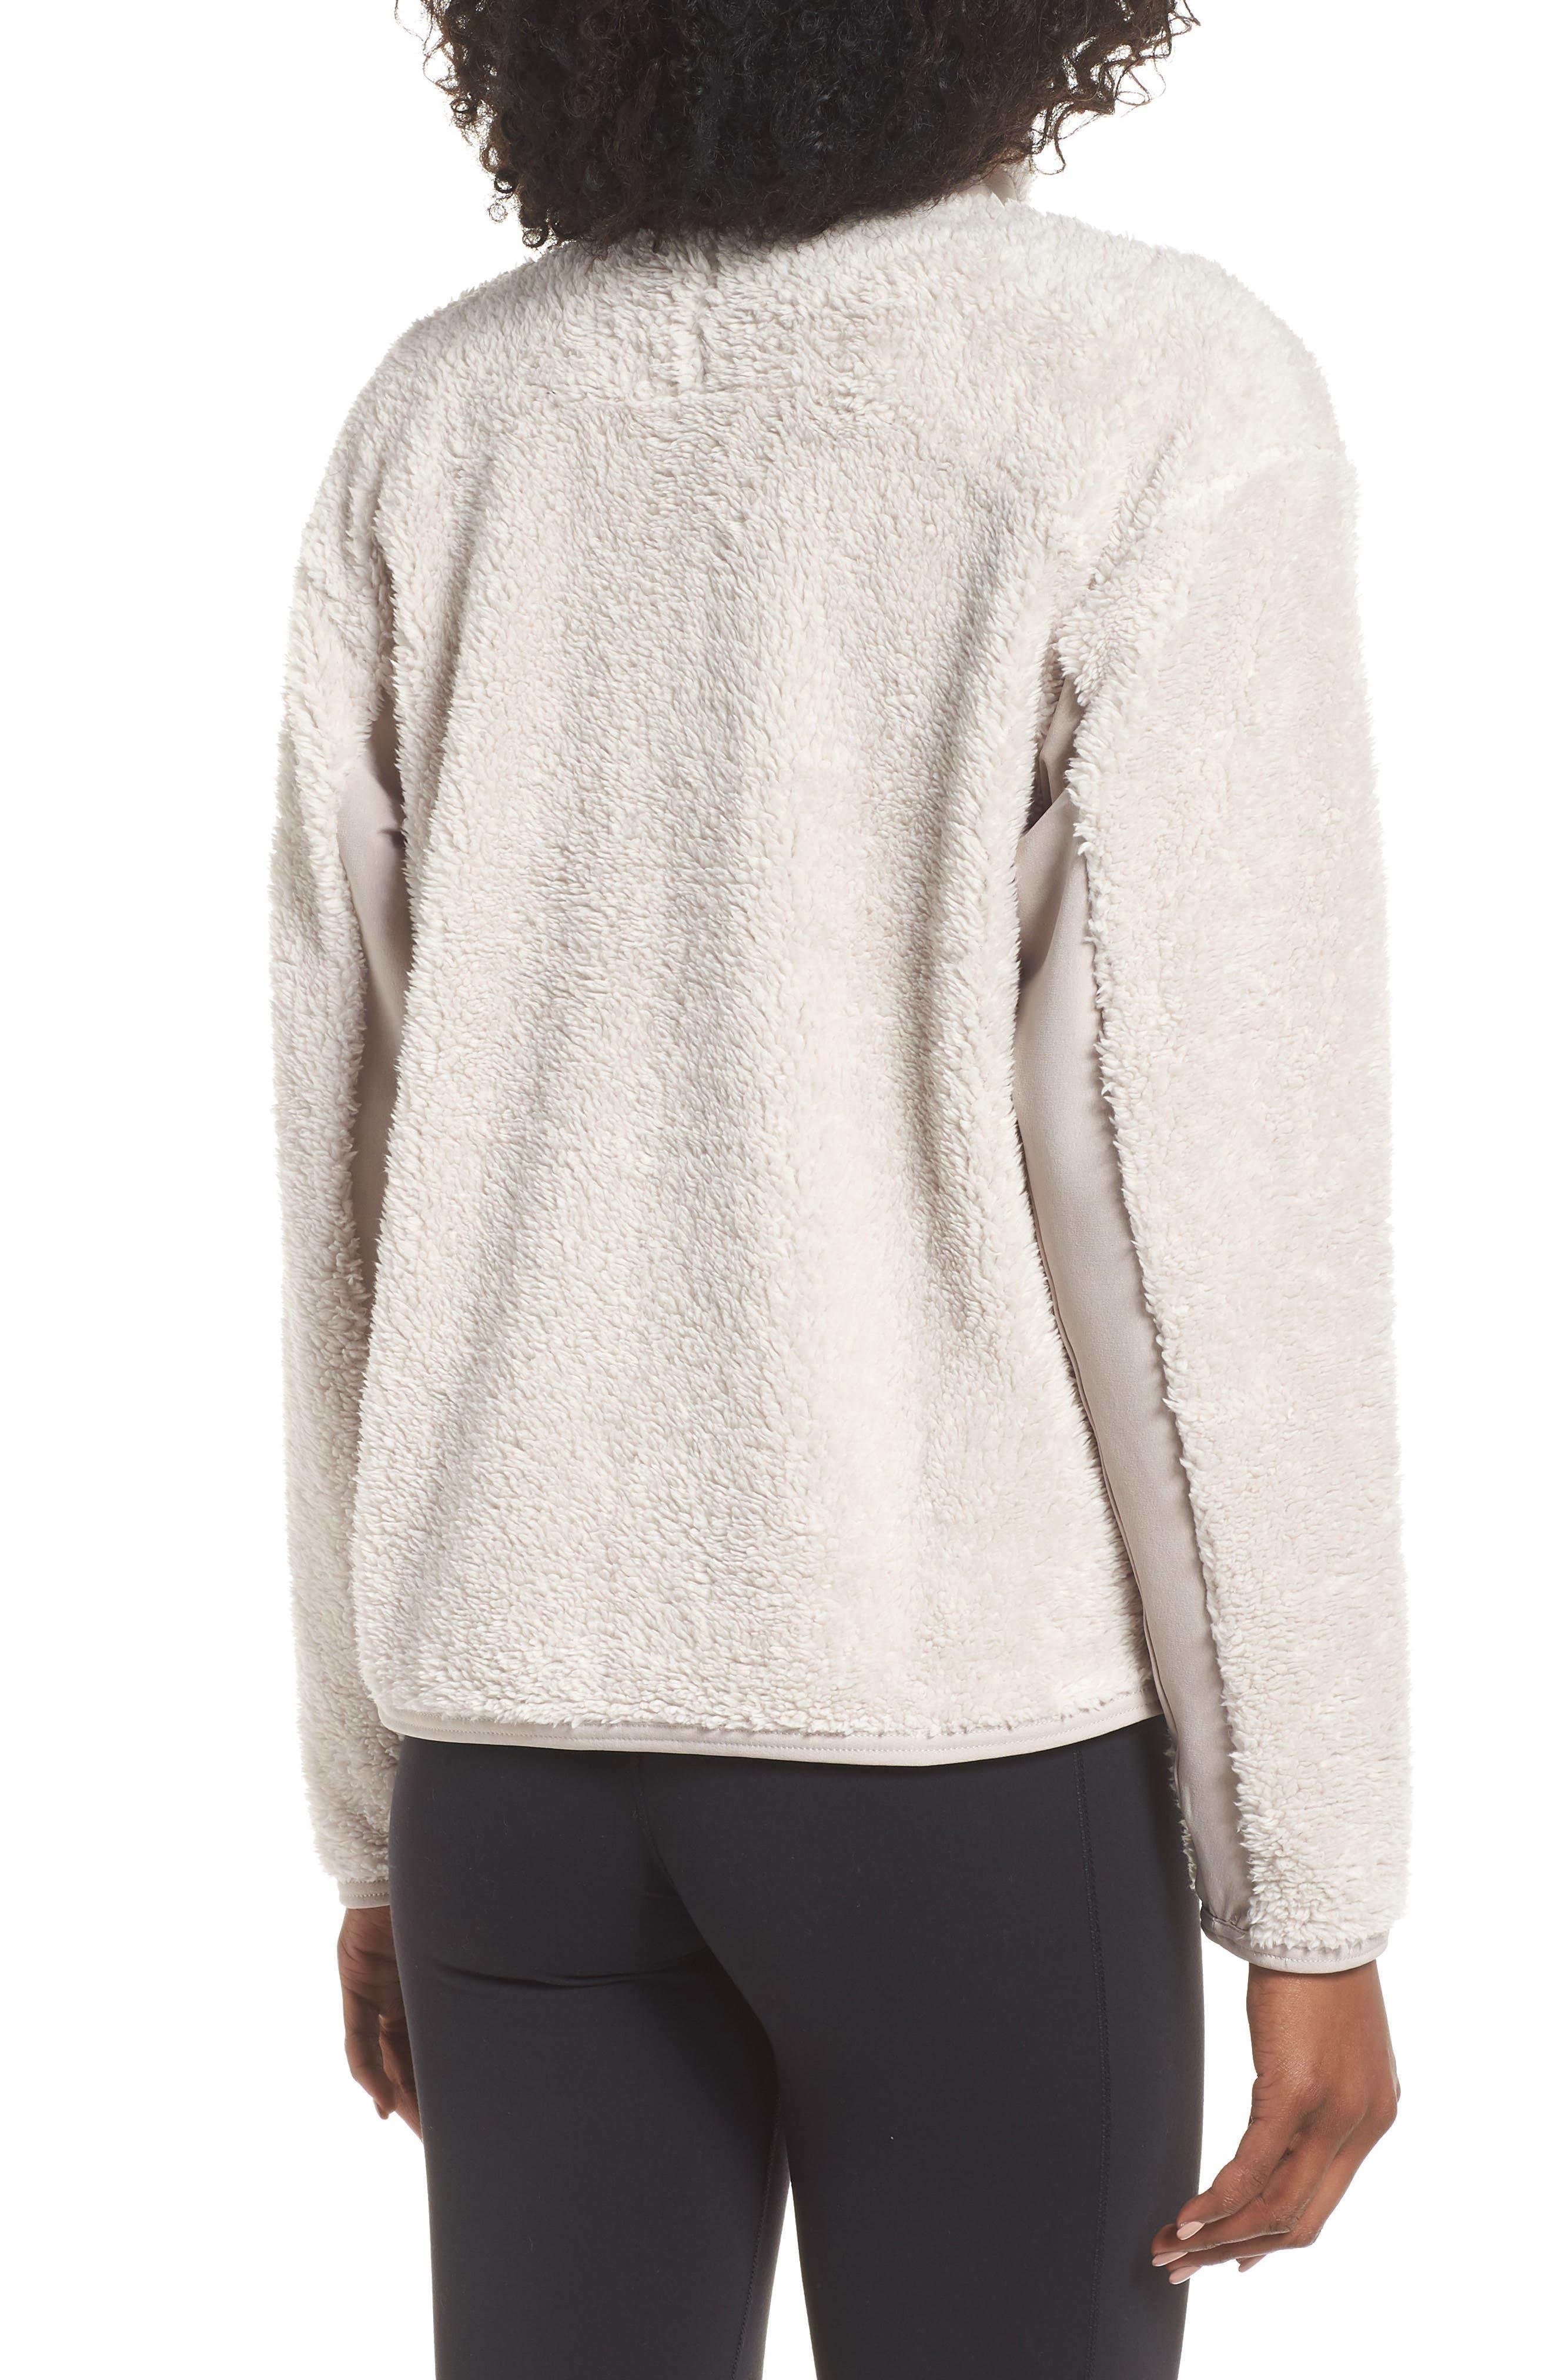 Therma Women's Full Zip Fleece Training Top,                             Alternate thumbnail 2, color,                             DESERT SAND/ MOON PARTICLE